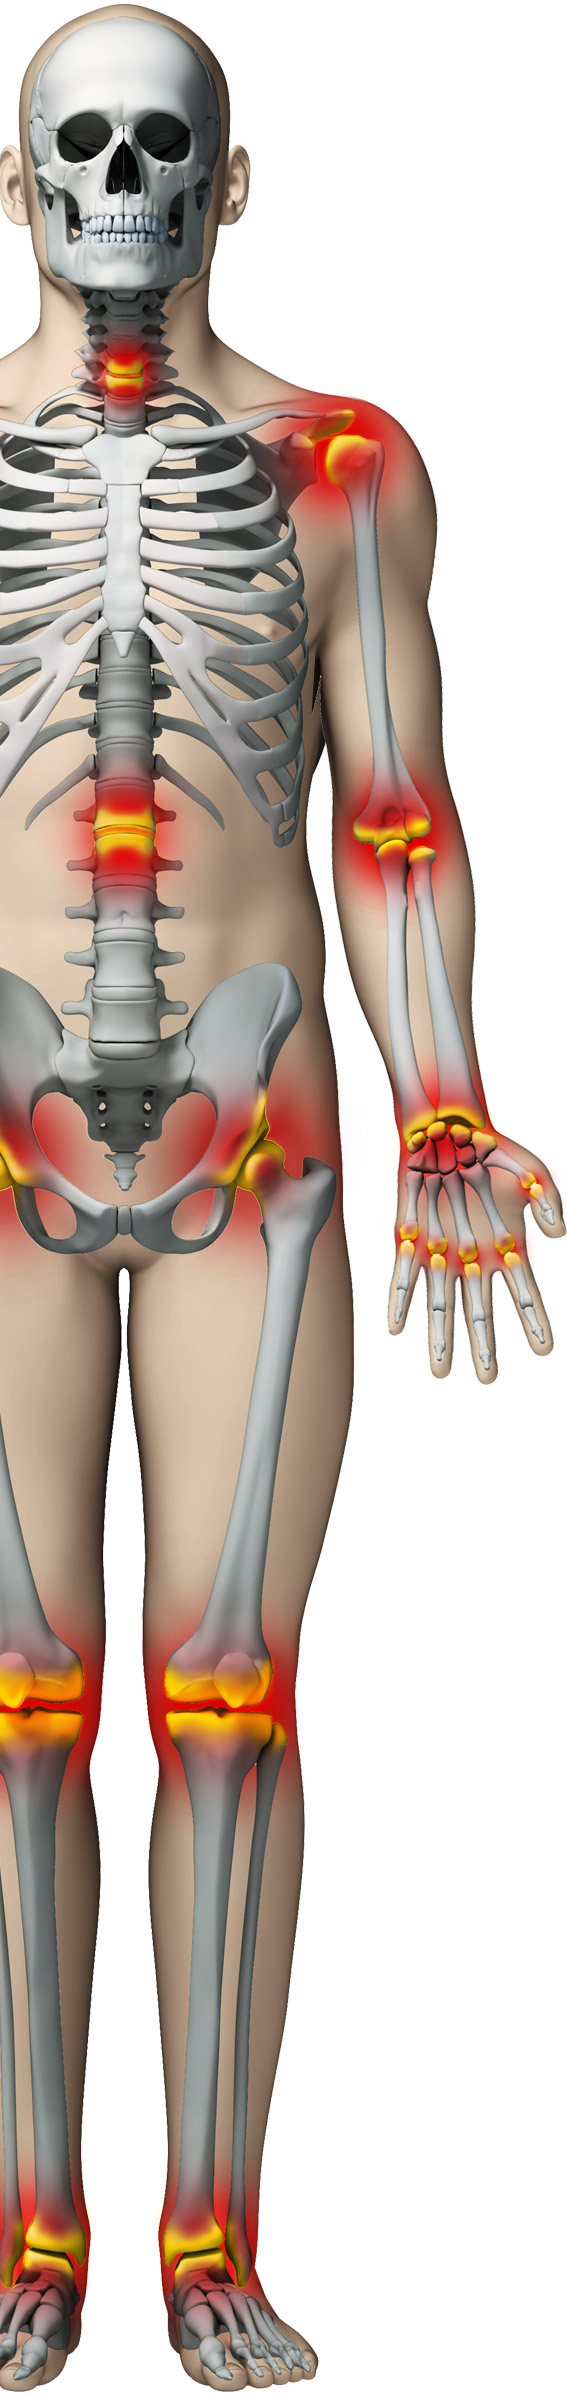 Sectia de reumatologie | Tratament afectiuni cu caracter reumatic